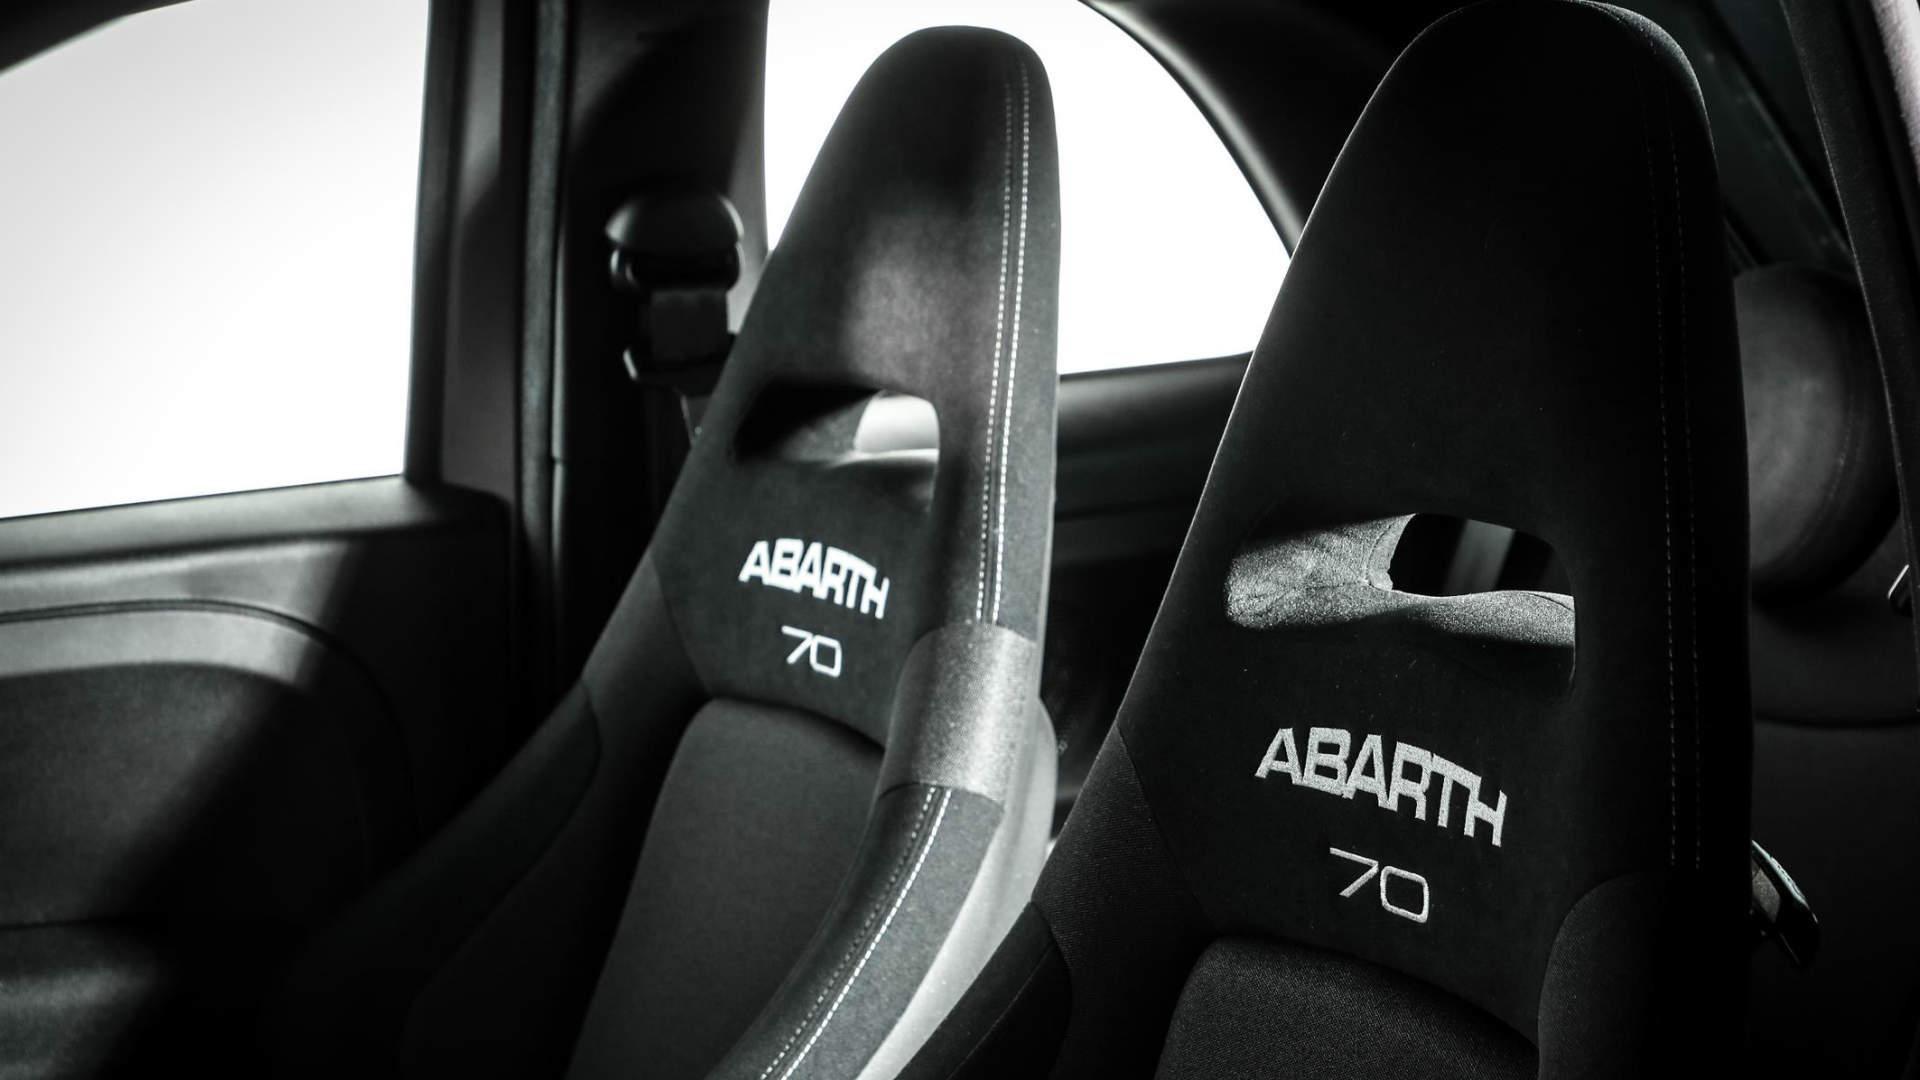 Abarth 595 Pista seats